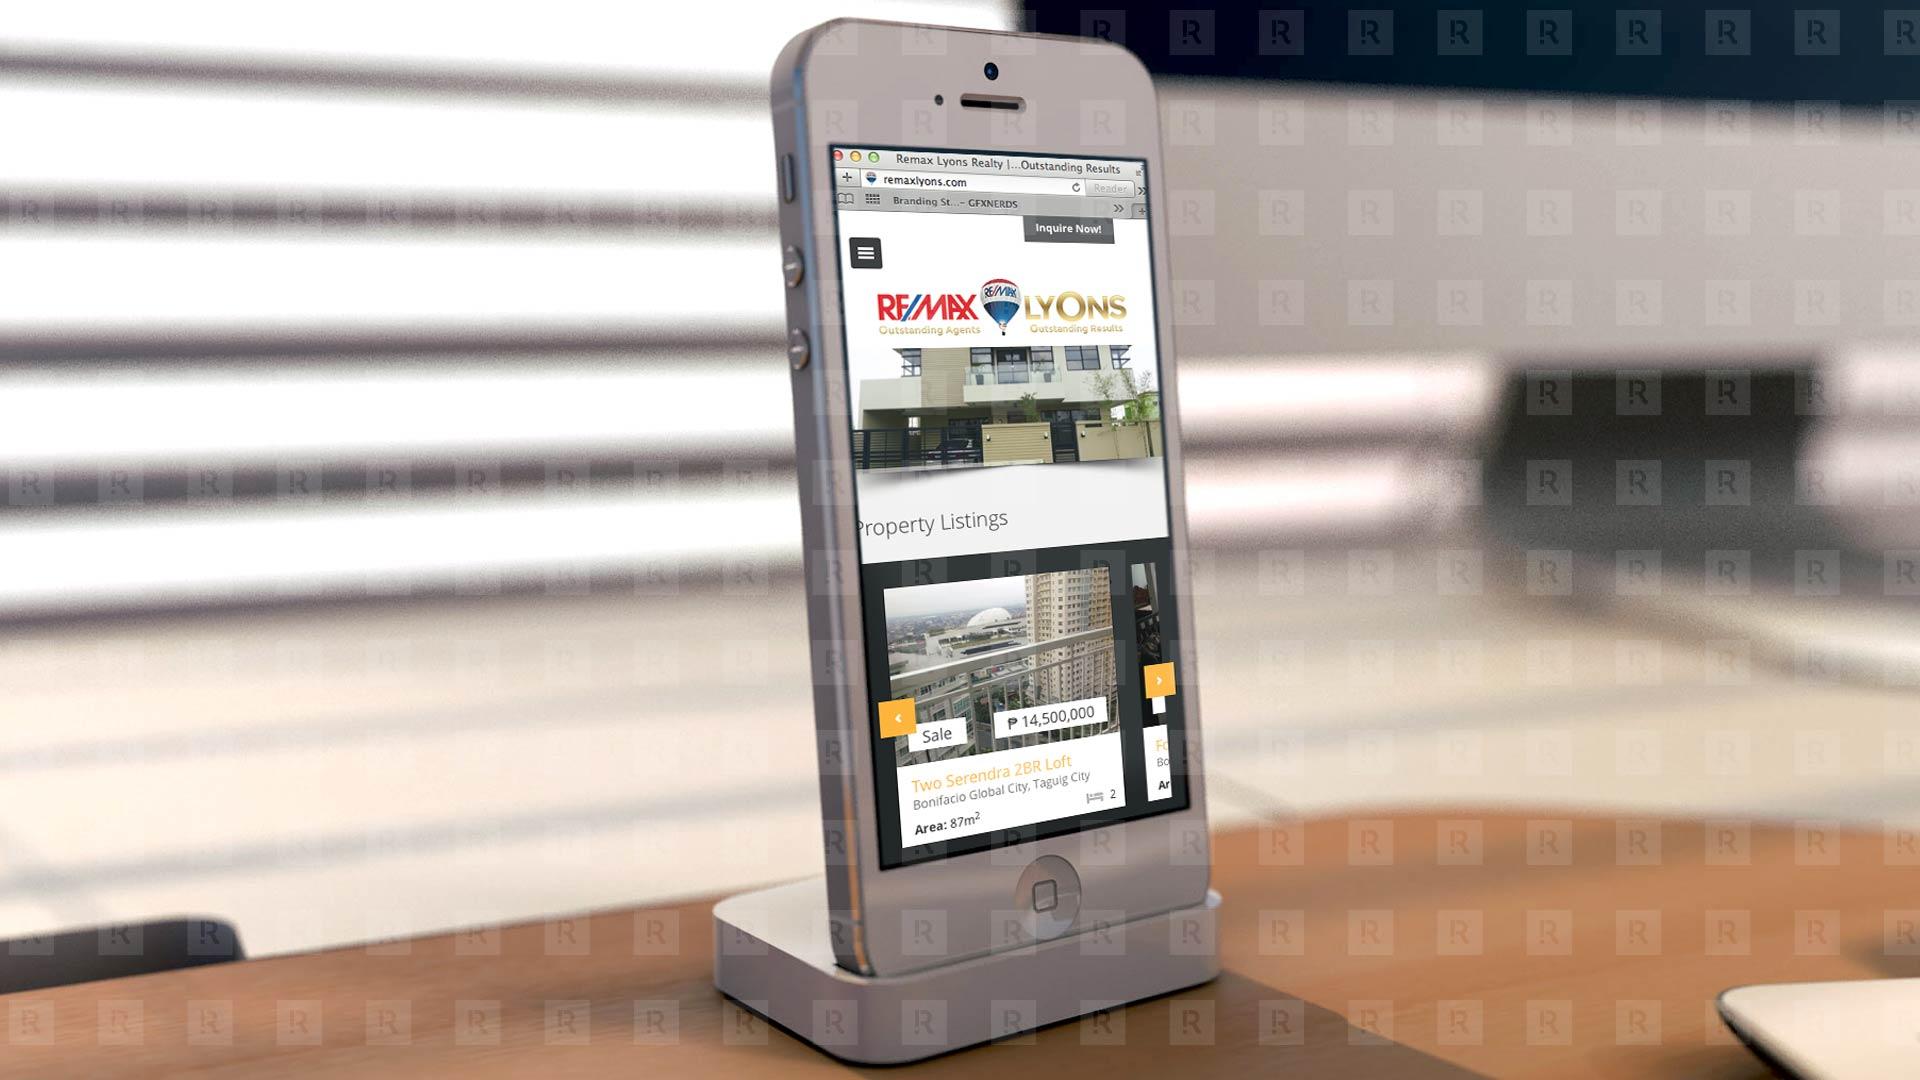 Remax Lyons Responsive Web Design